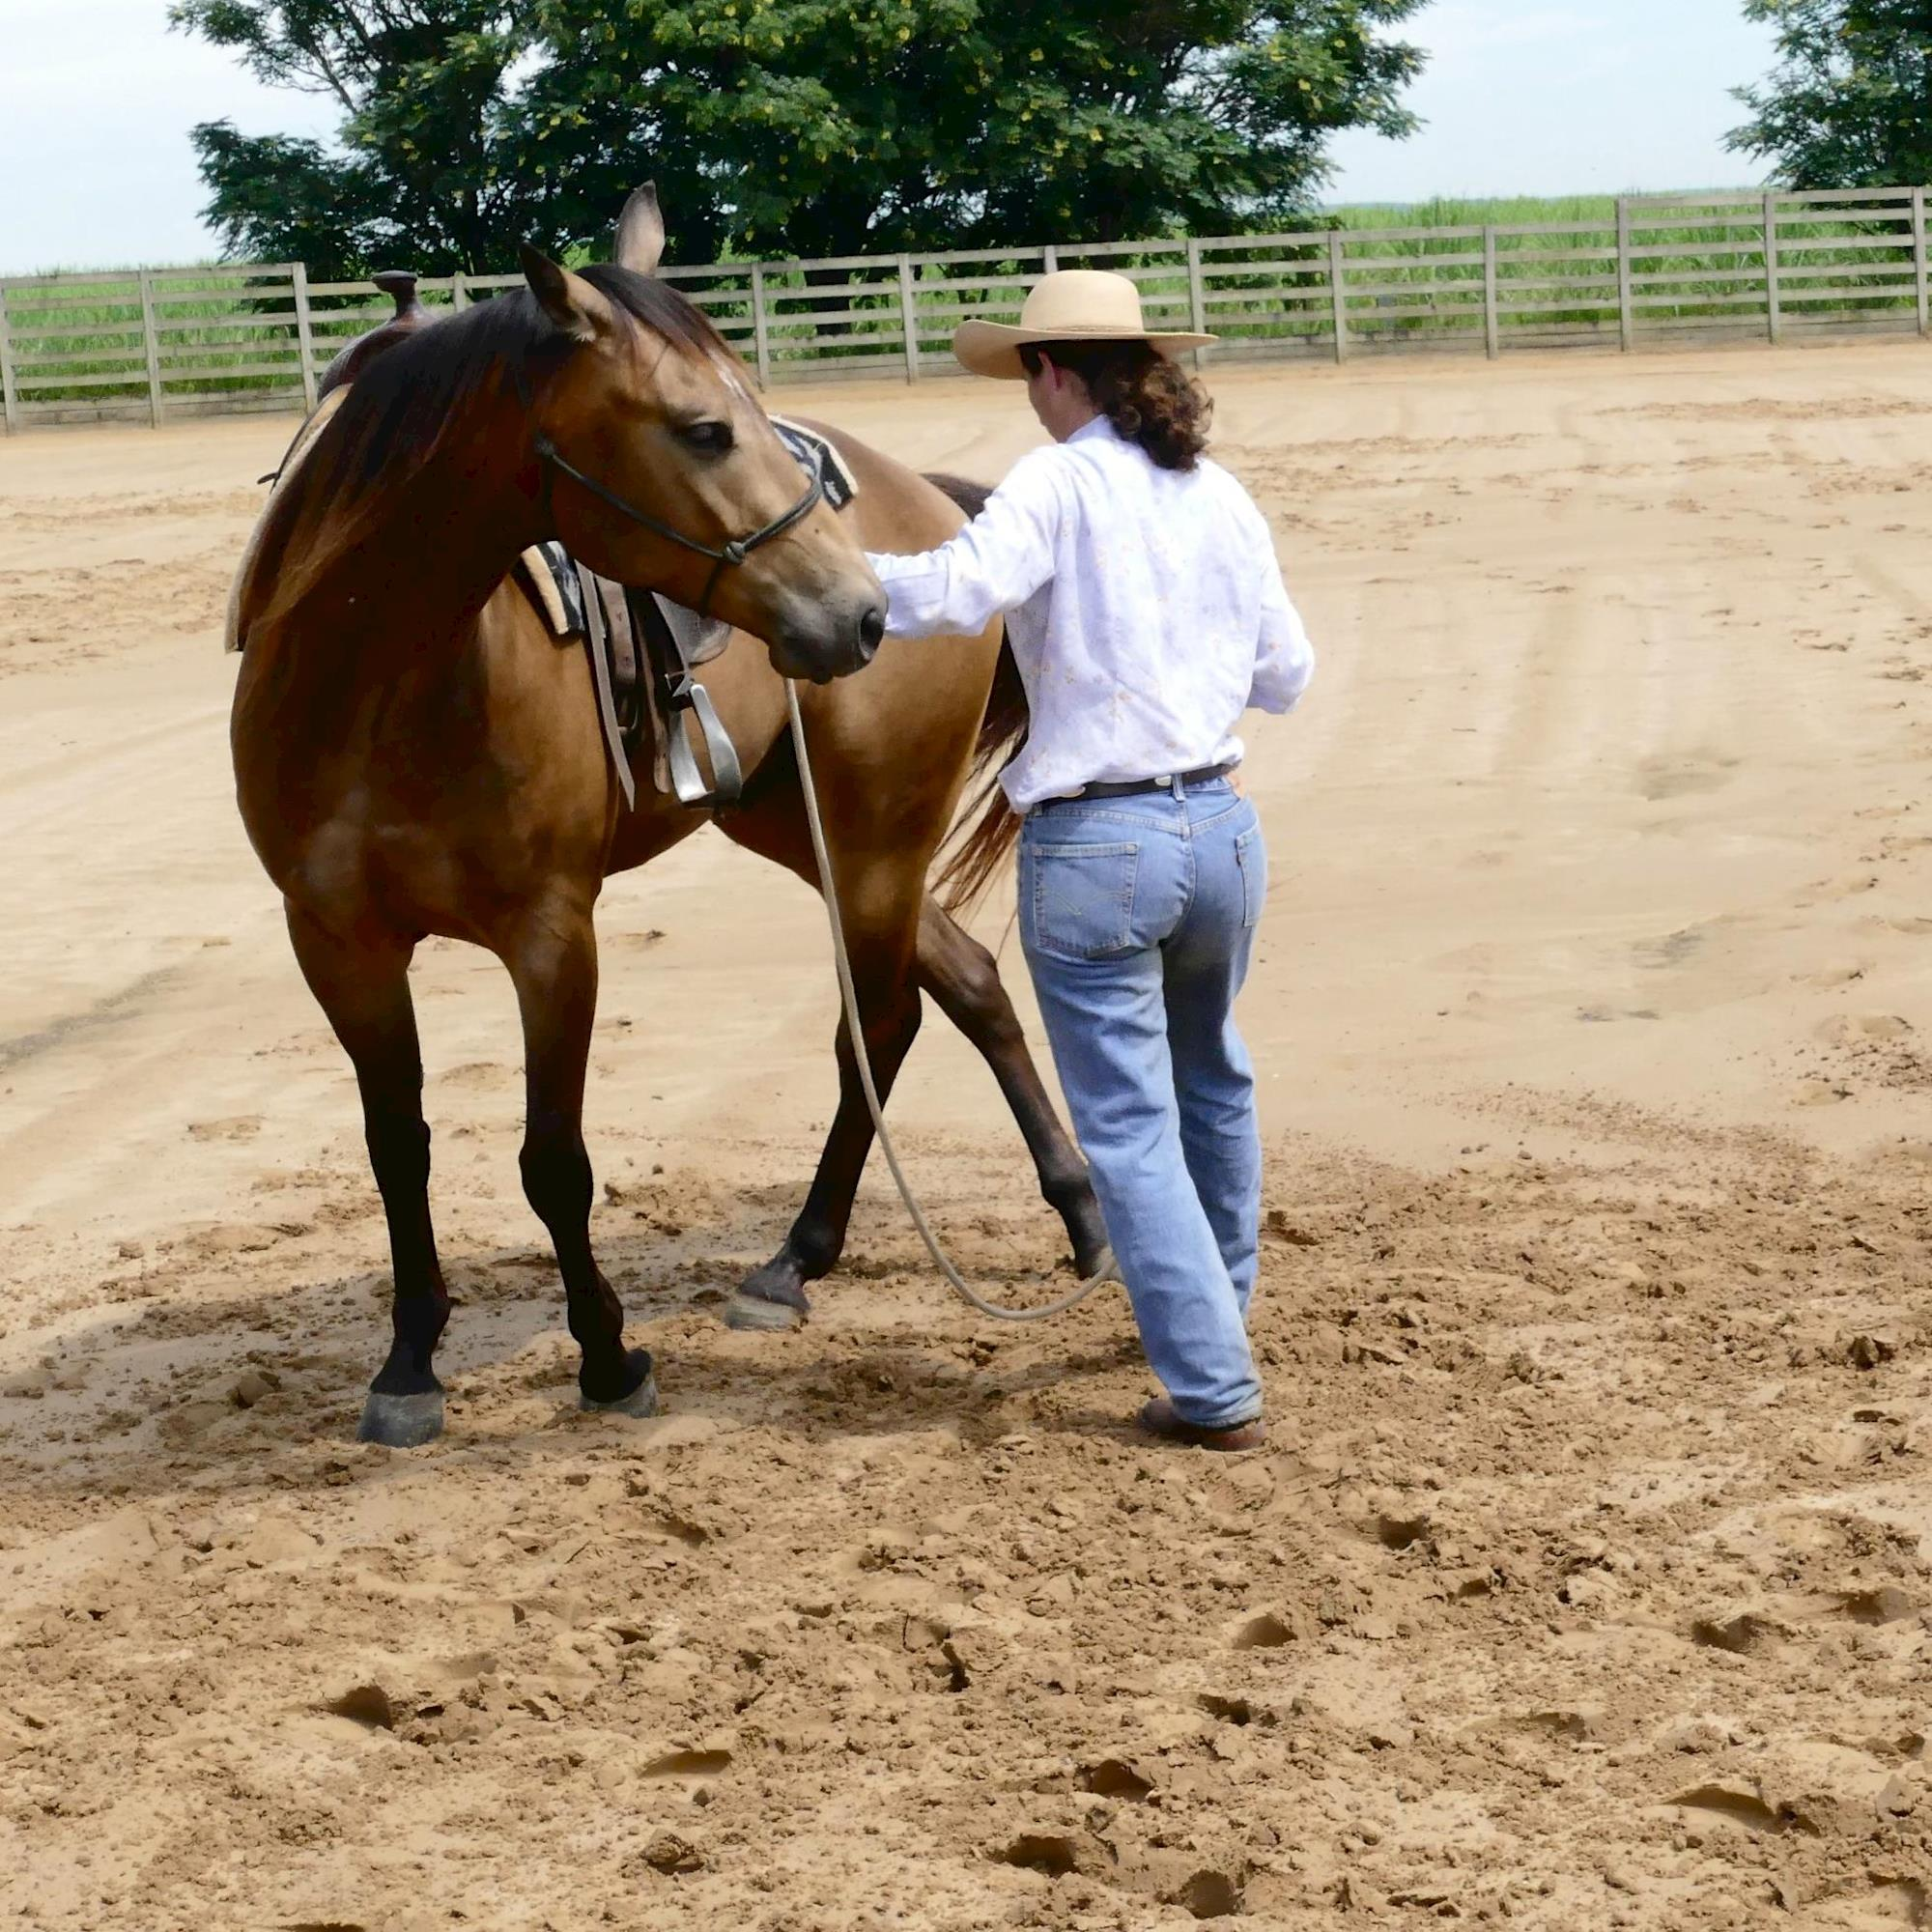 treinamento - Dudi Ometto, horse 95, Horse, Rédeas, Eduardo Borba